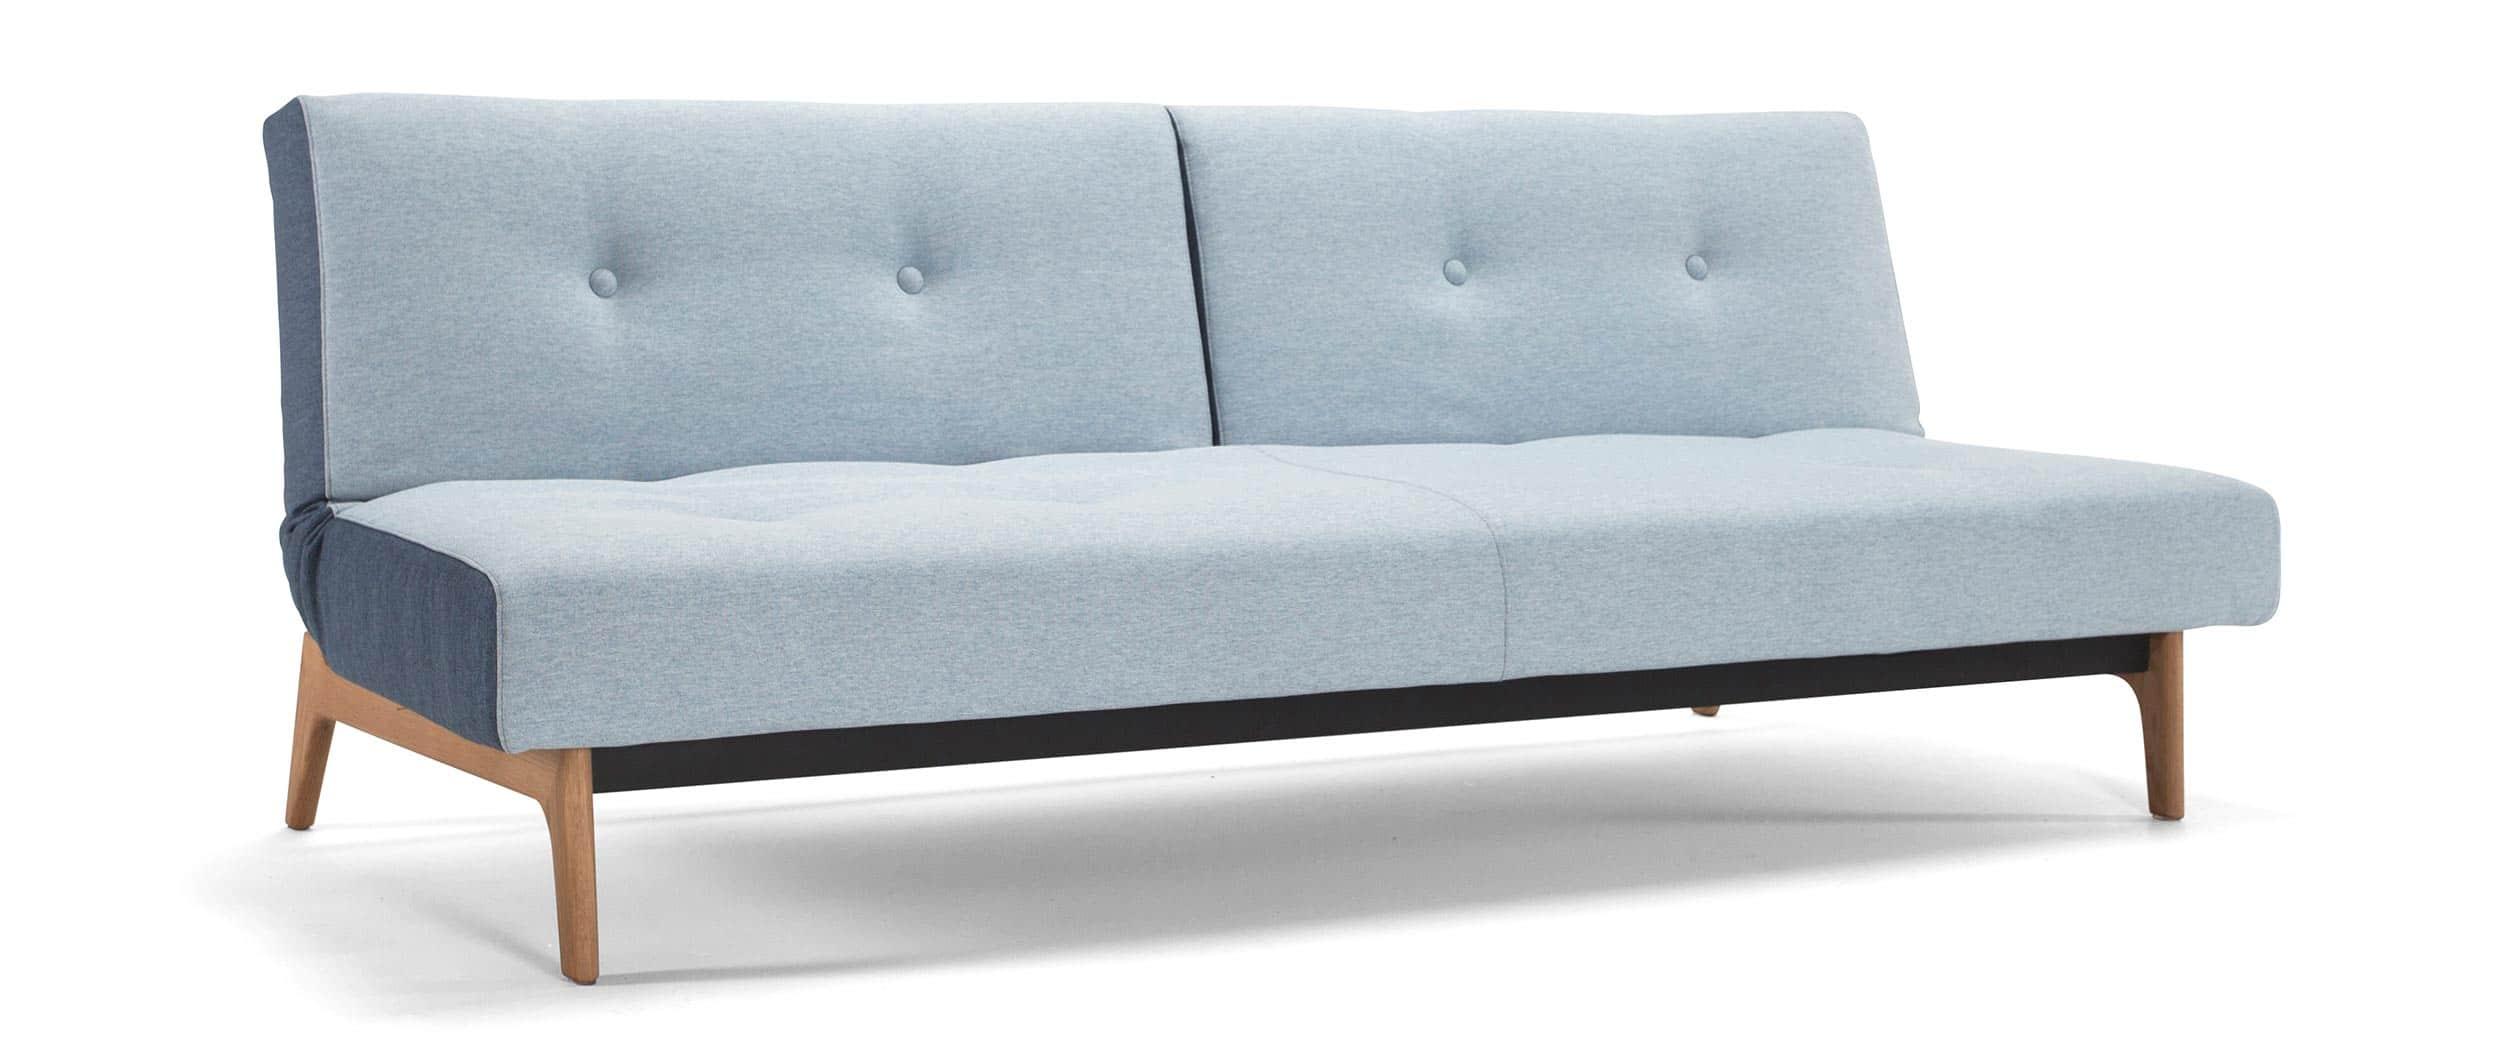 Innovation Sofa Bezug Latest Innovation Idun Lounger Sofa With